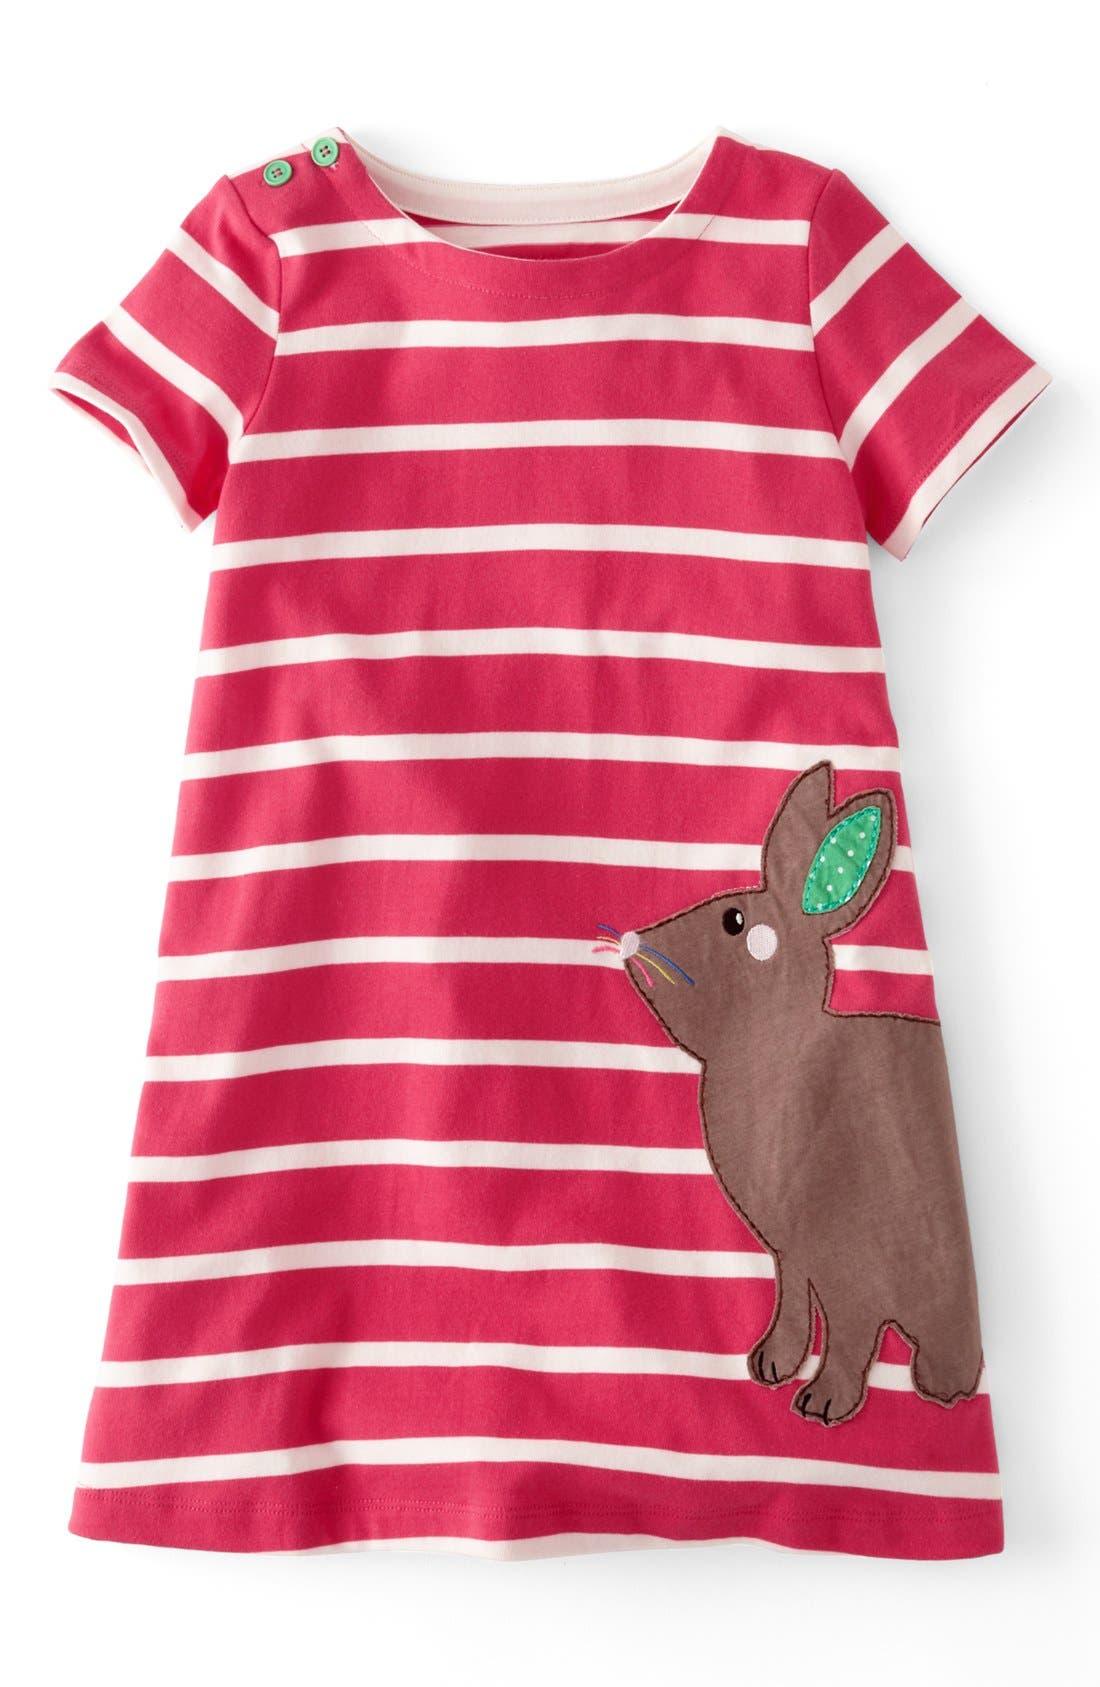 Alternate Image 1 Selected - Mini Boden Appliqué Dress (Toddler Girls, Little Girls & Big Girls)